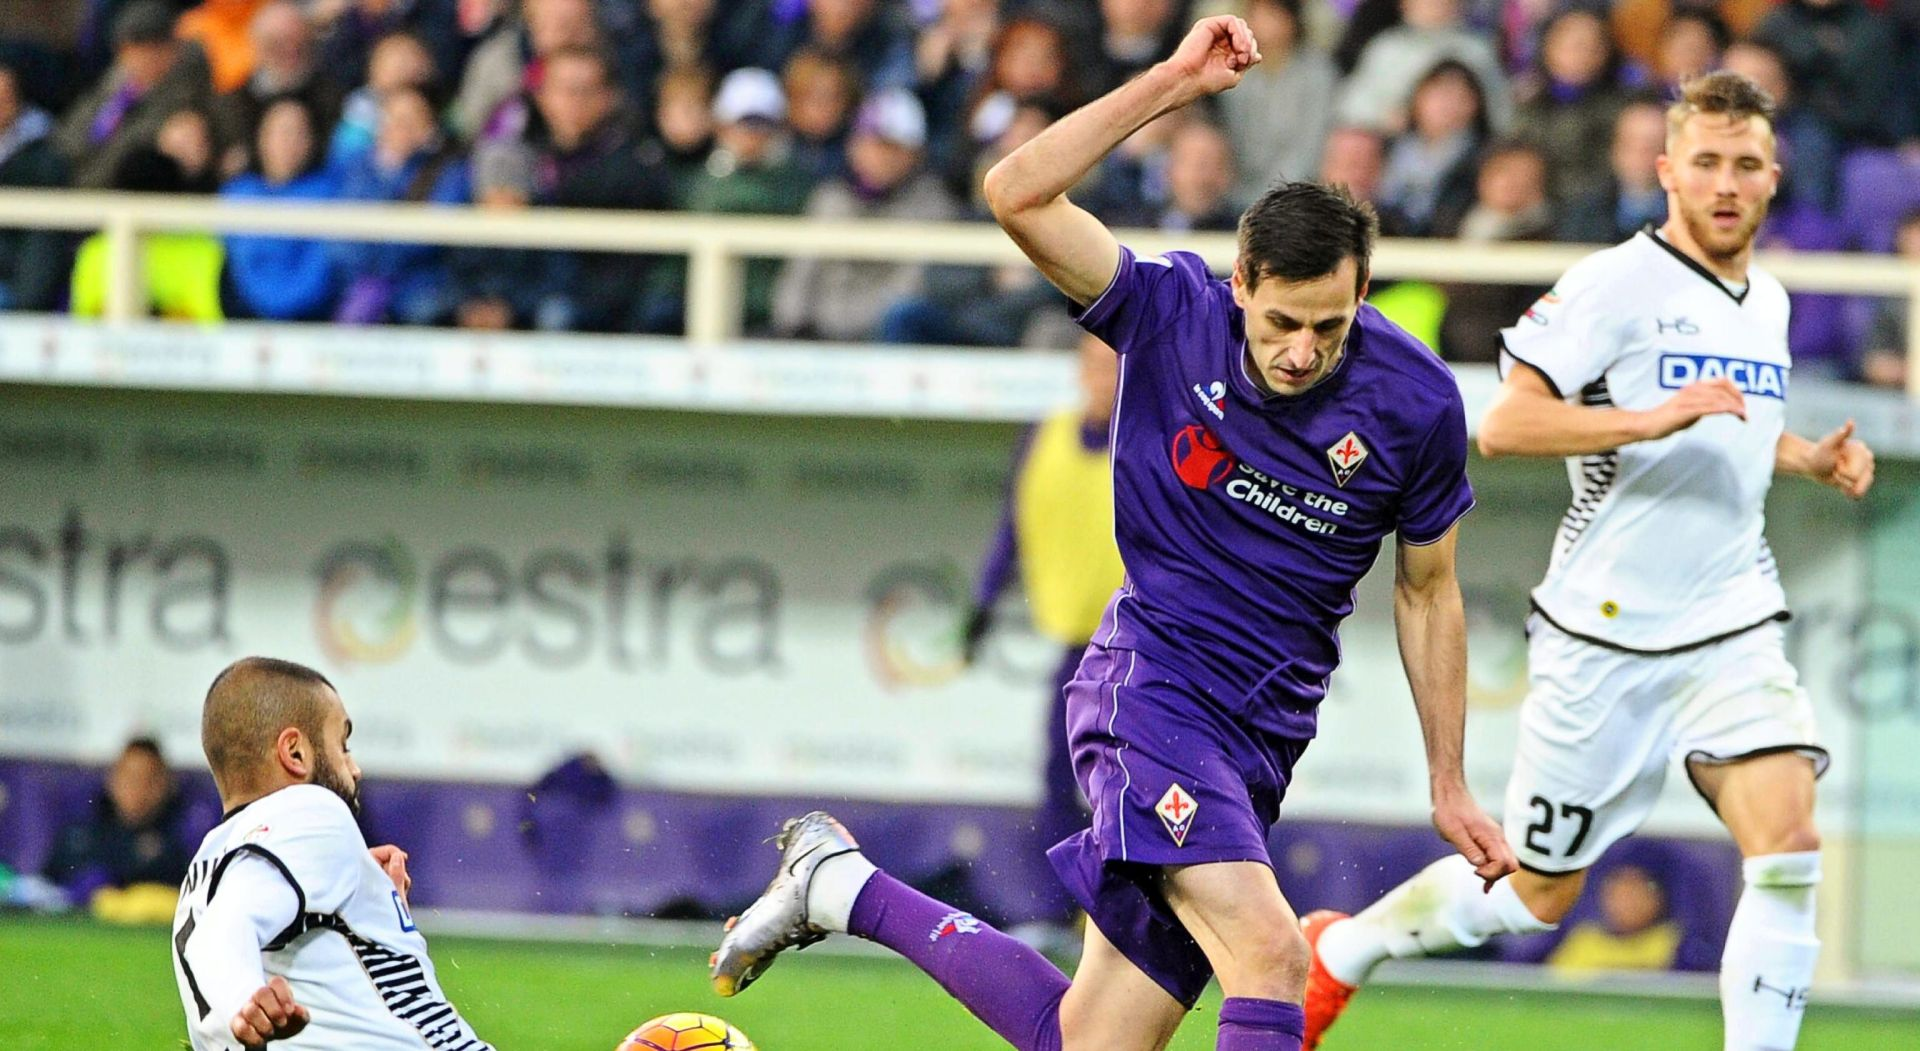 SERIE A Pobjeda Fiorentine, Kalinić načeo Udinese i izborio jedanaesterac, Badelj asistent